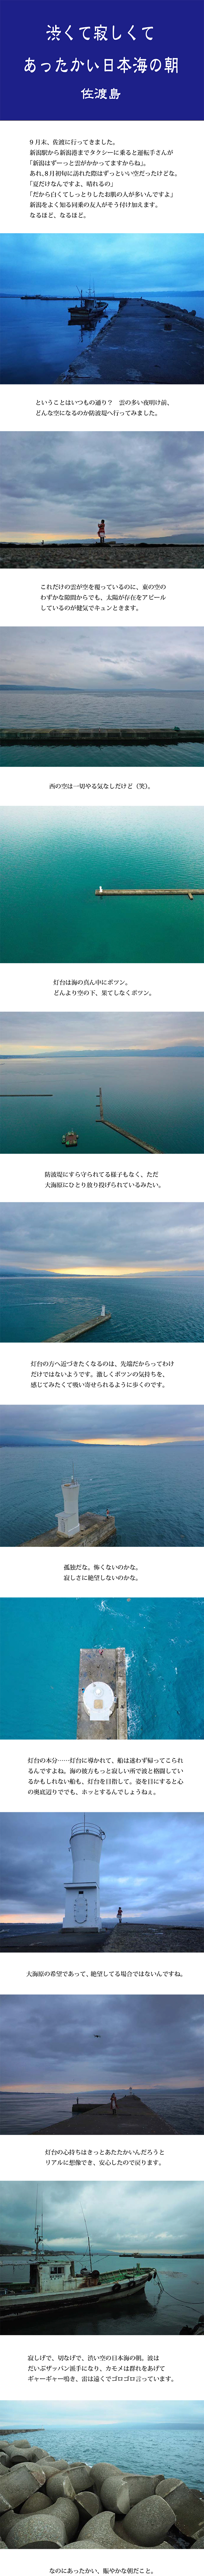 tomako191030.jpg